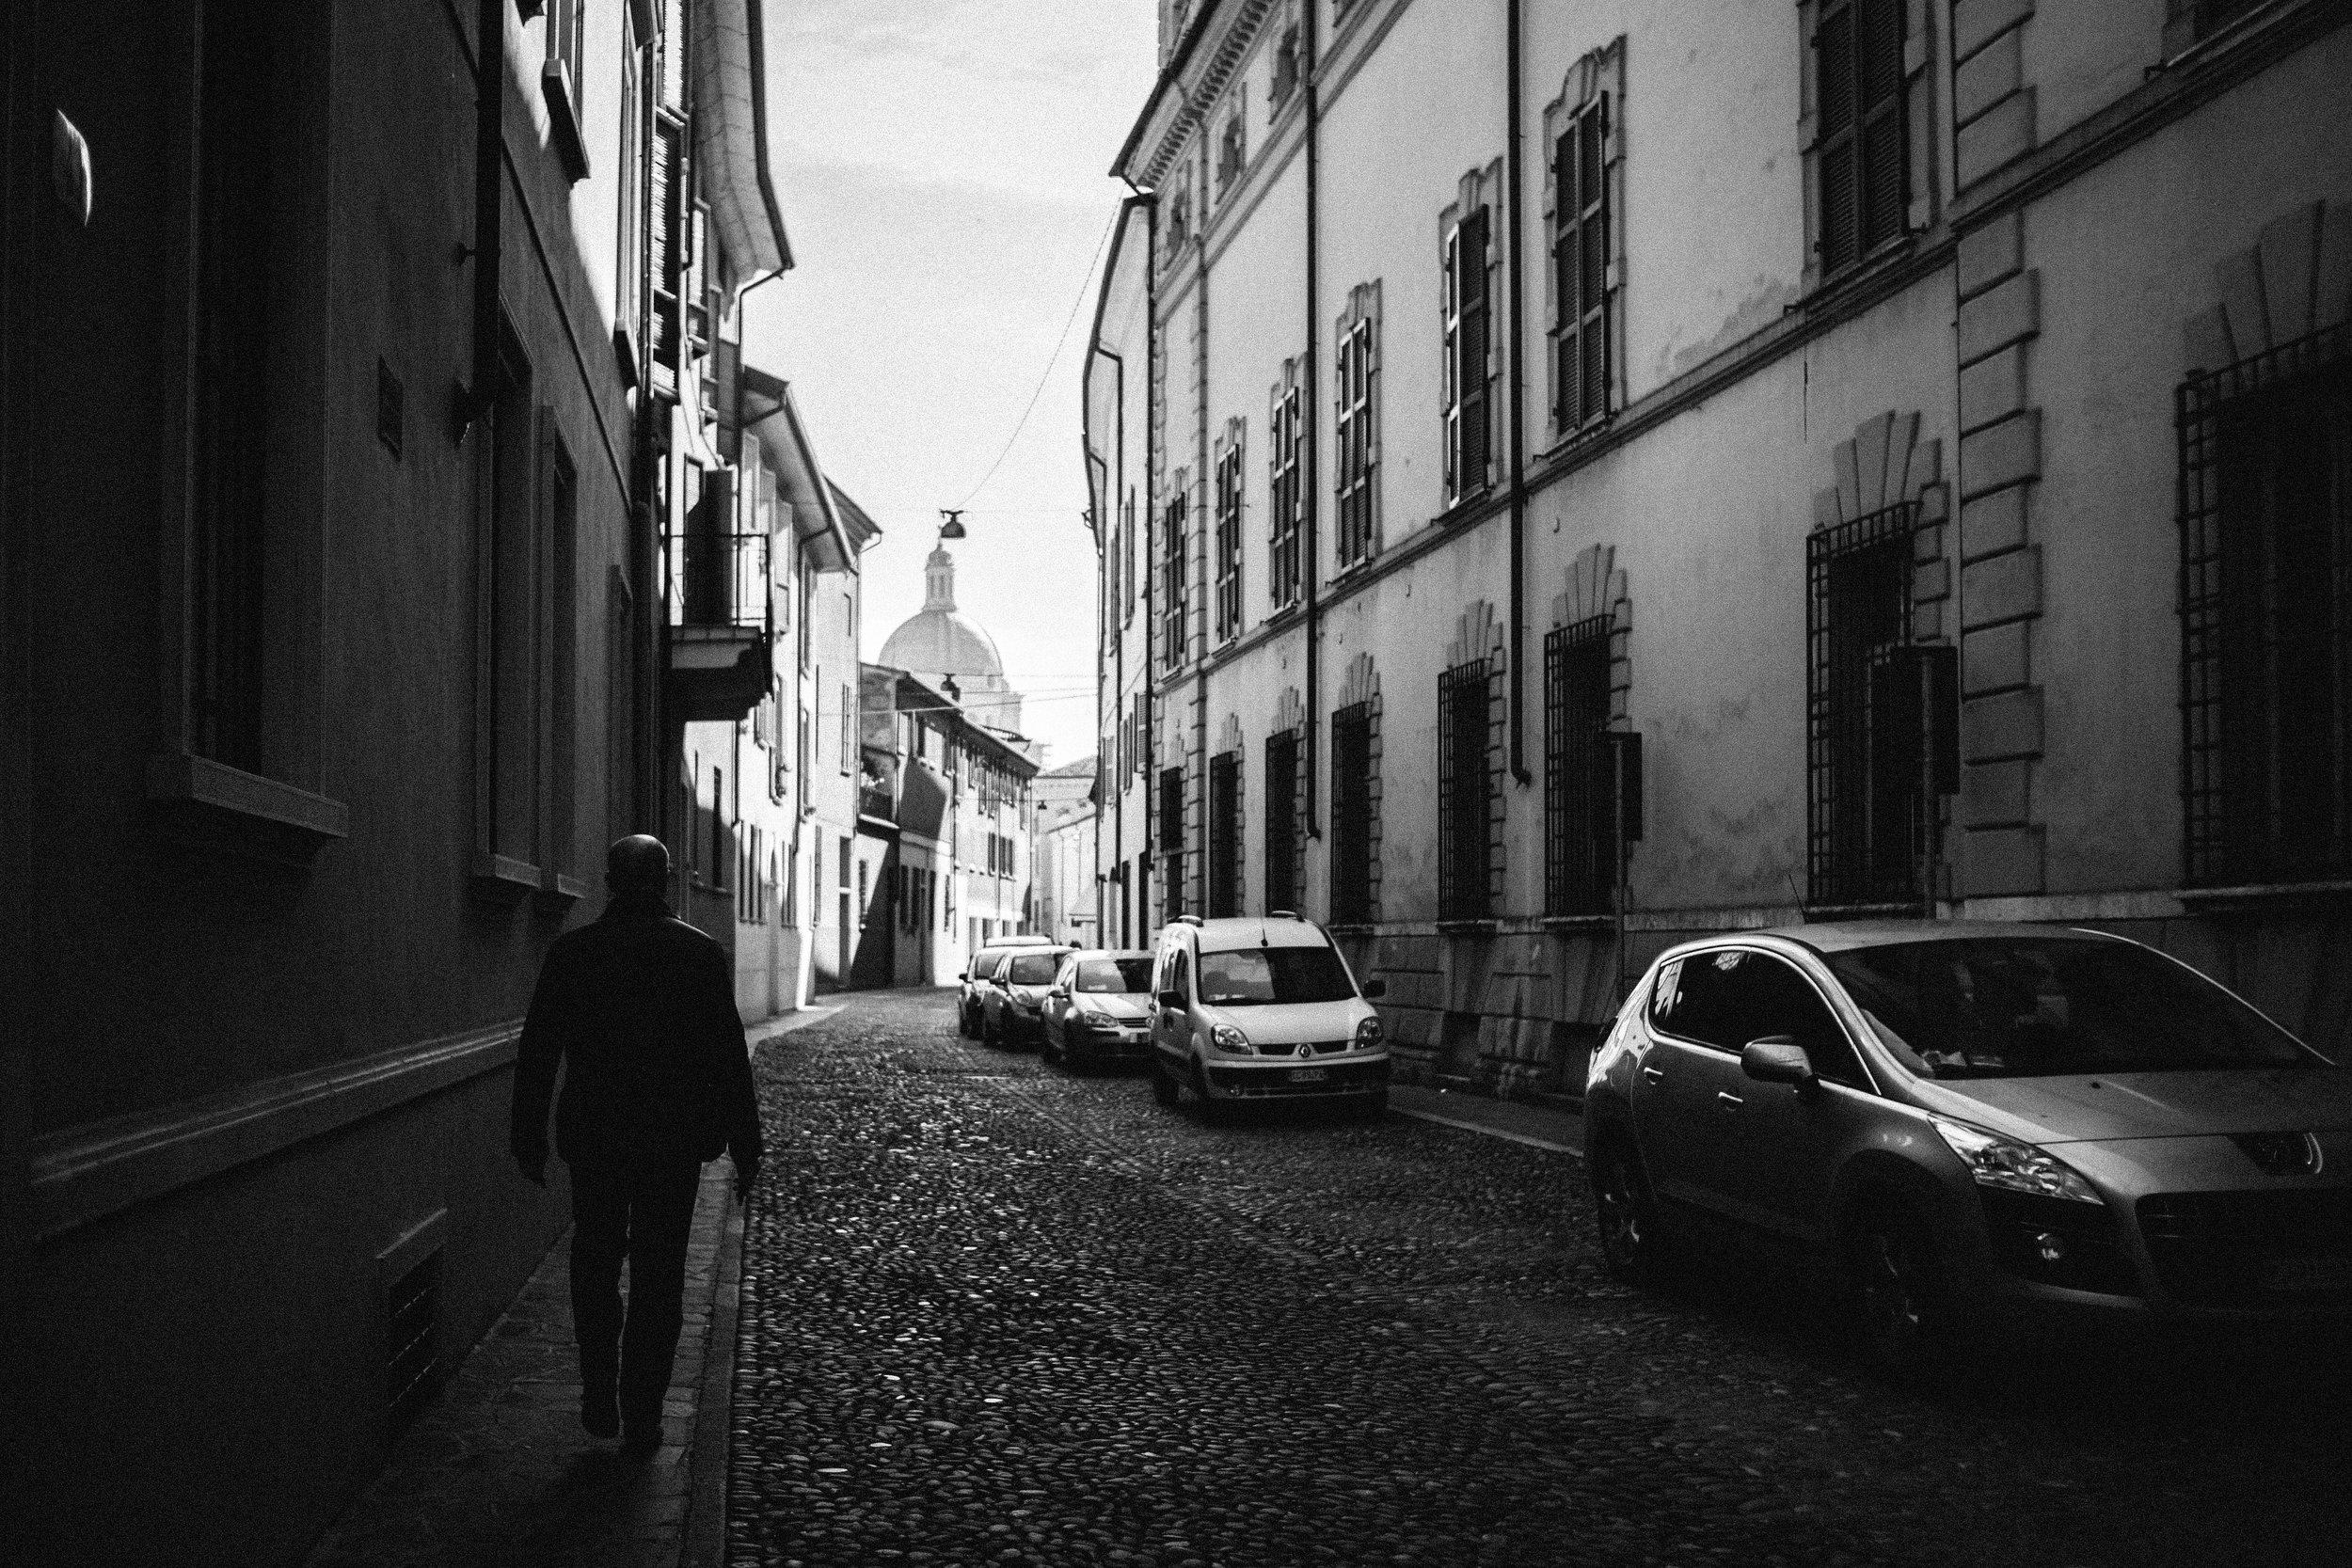 004 - Mantova.jpg